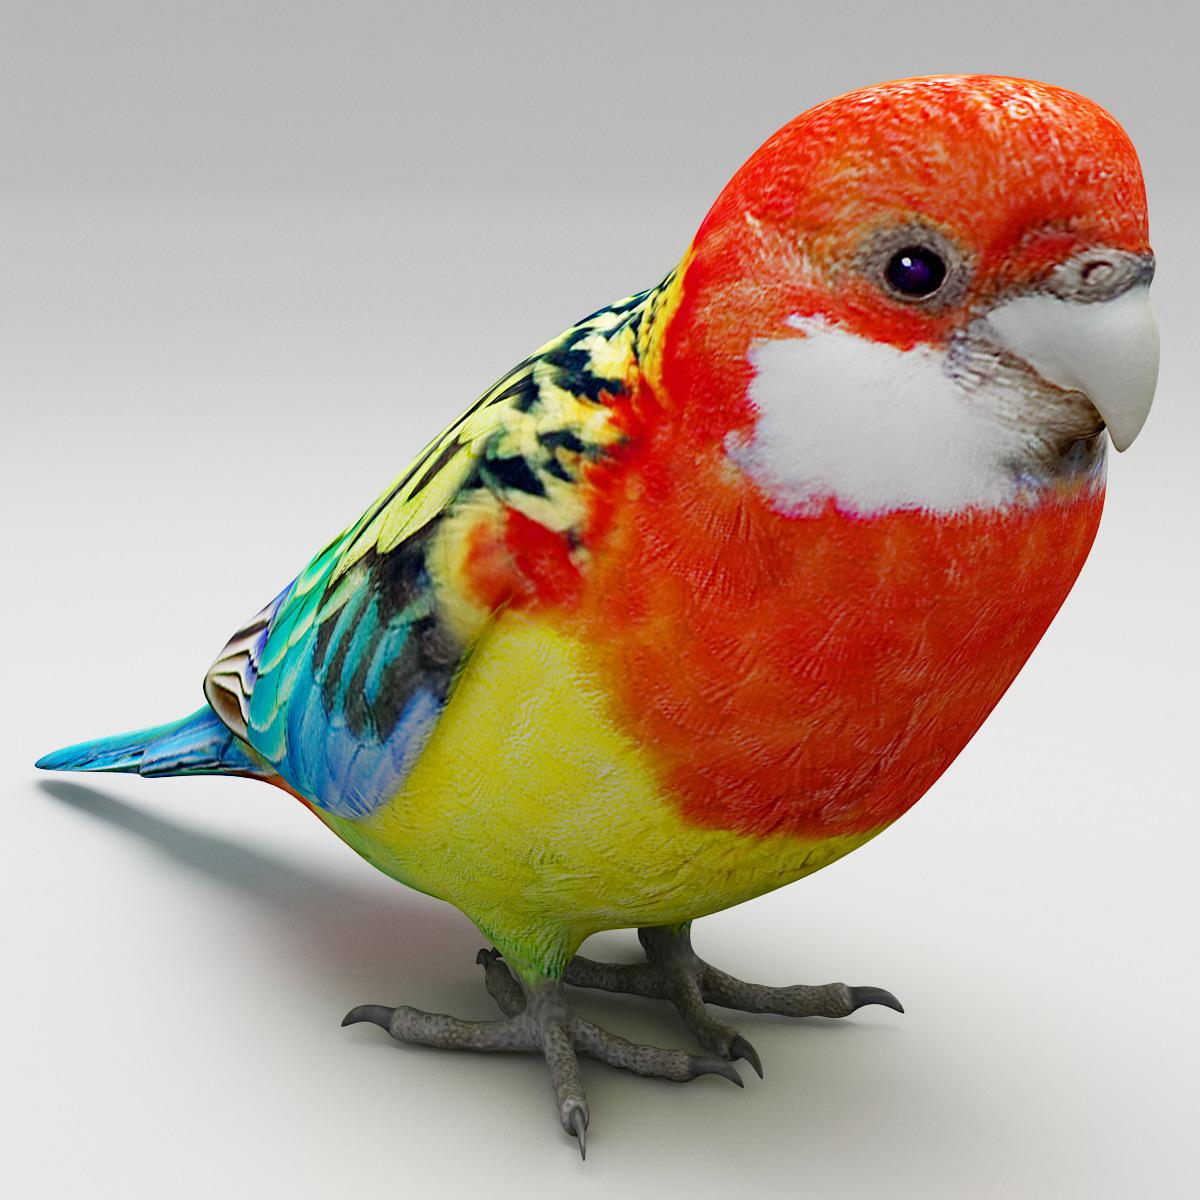 eastern rosella bird 3d model